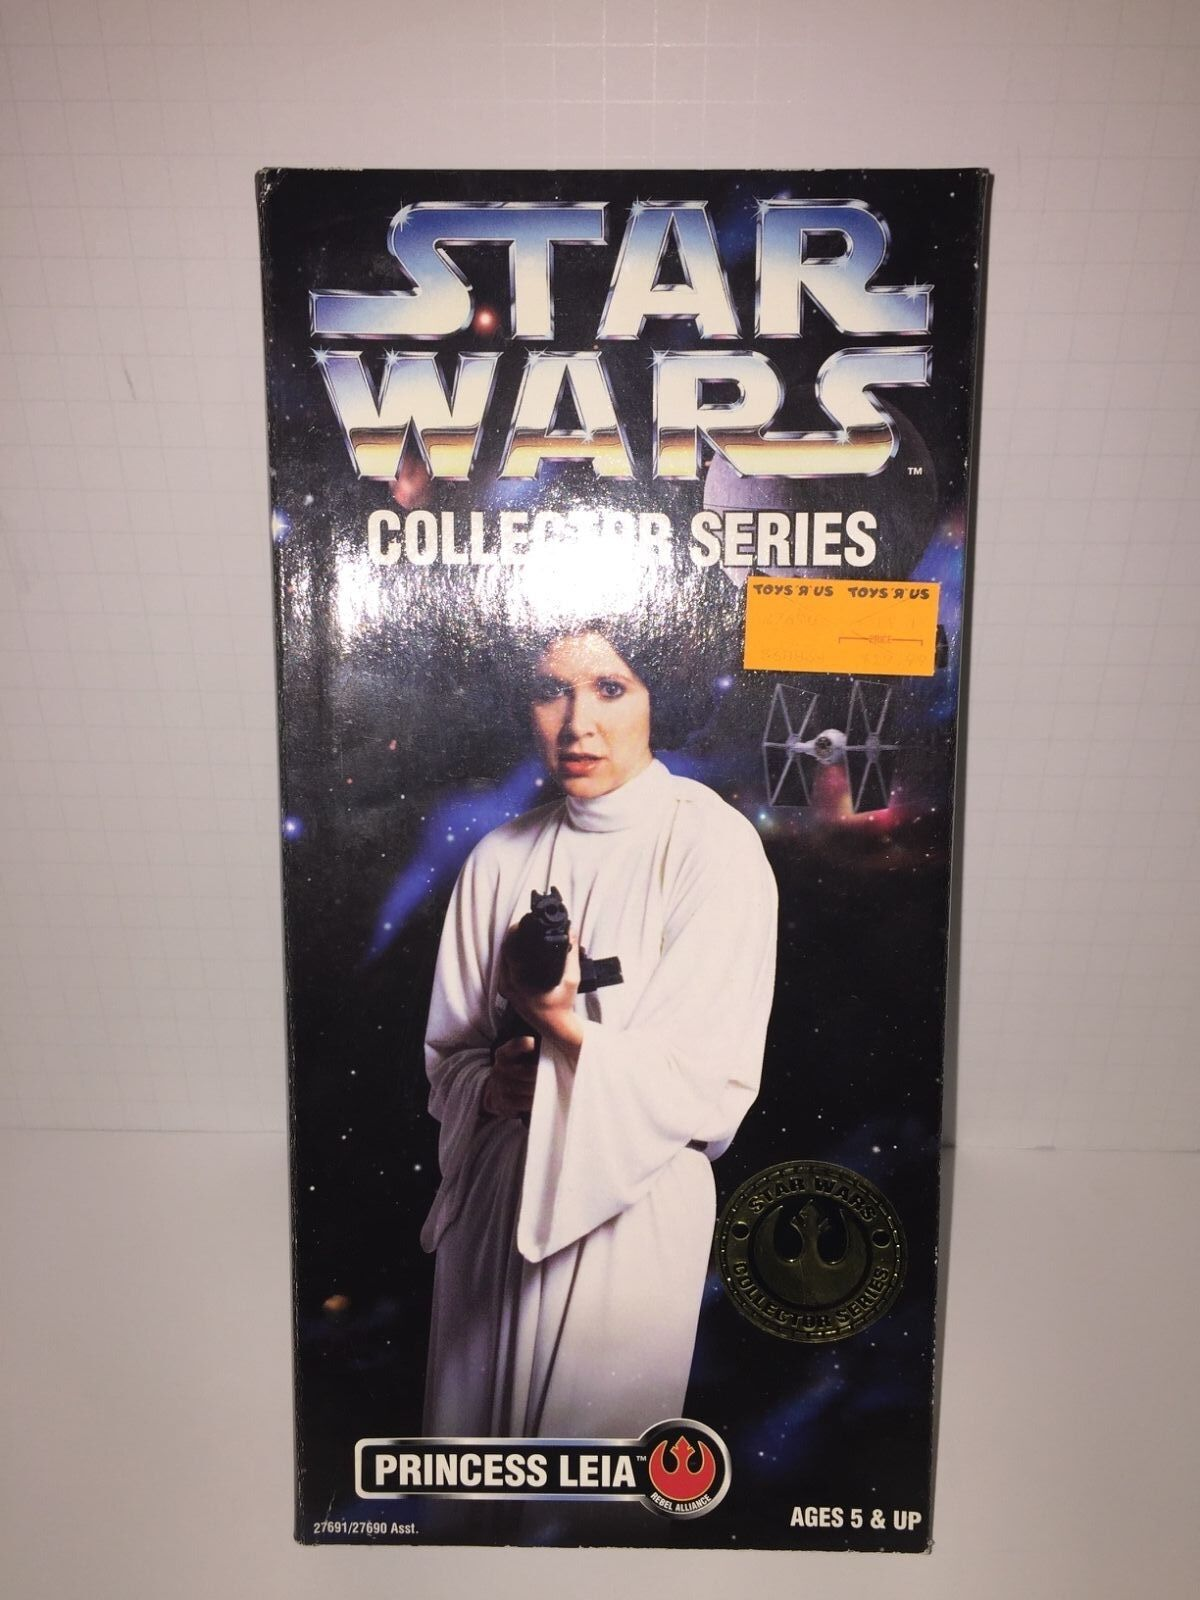 STAR WARS COLLECTOR SERIES PRINCESS LEIA 12  DOLL 1996 HASBRO KENNER NEW